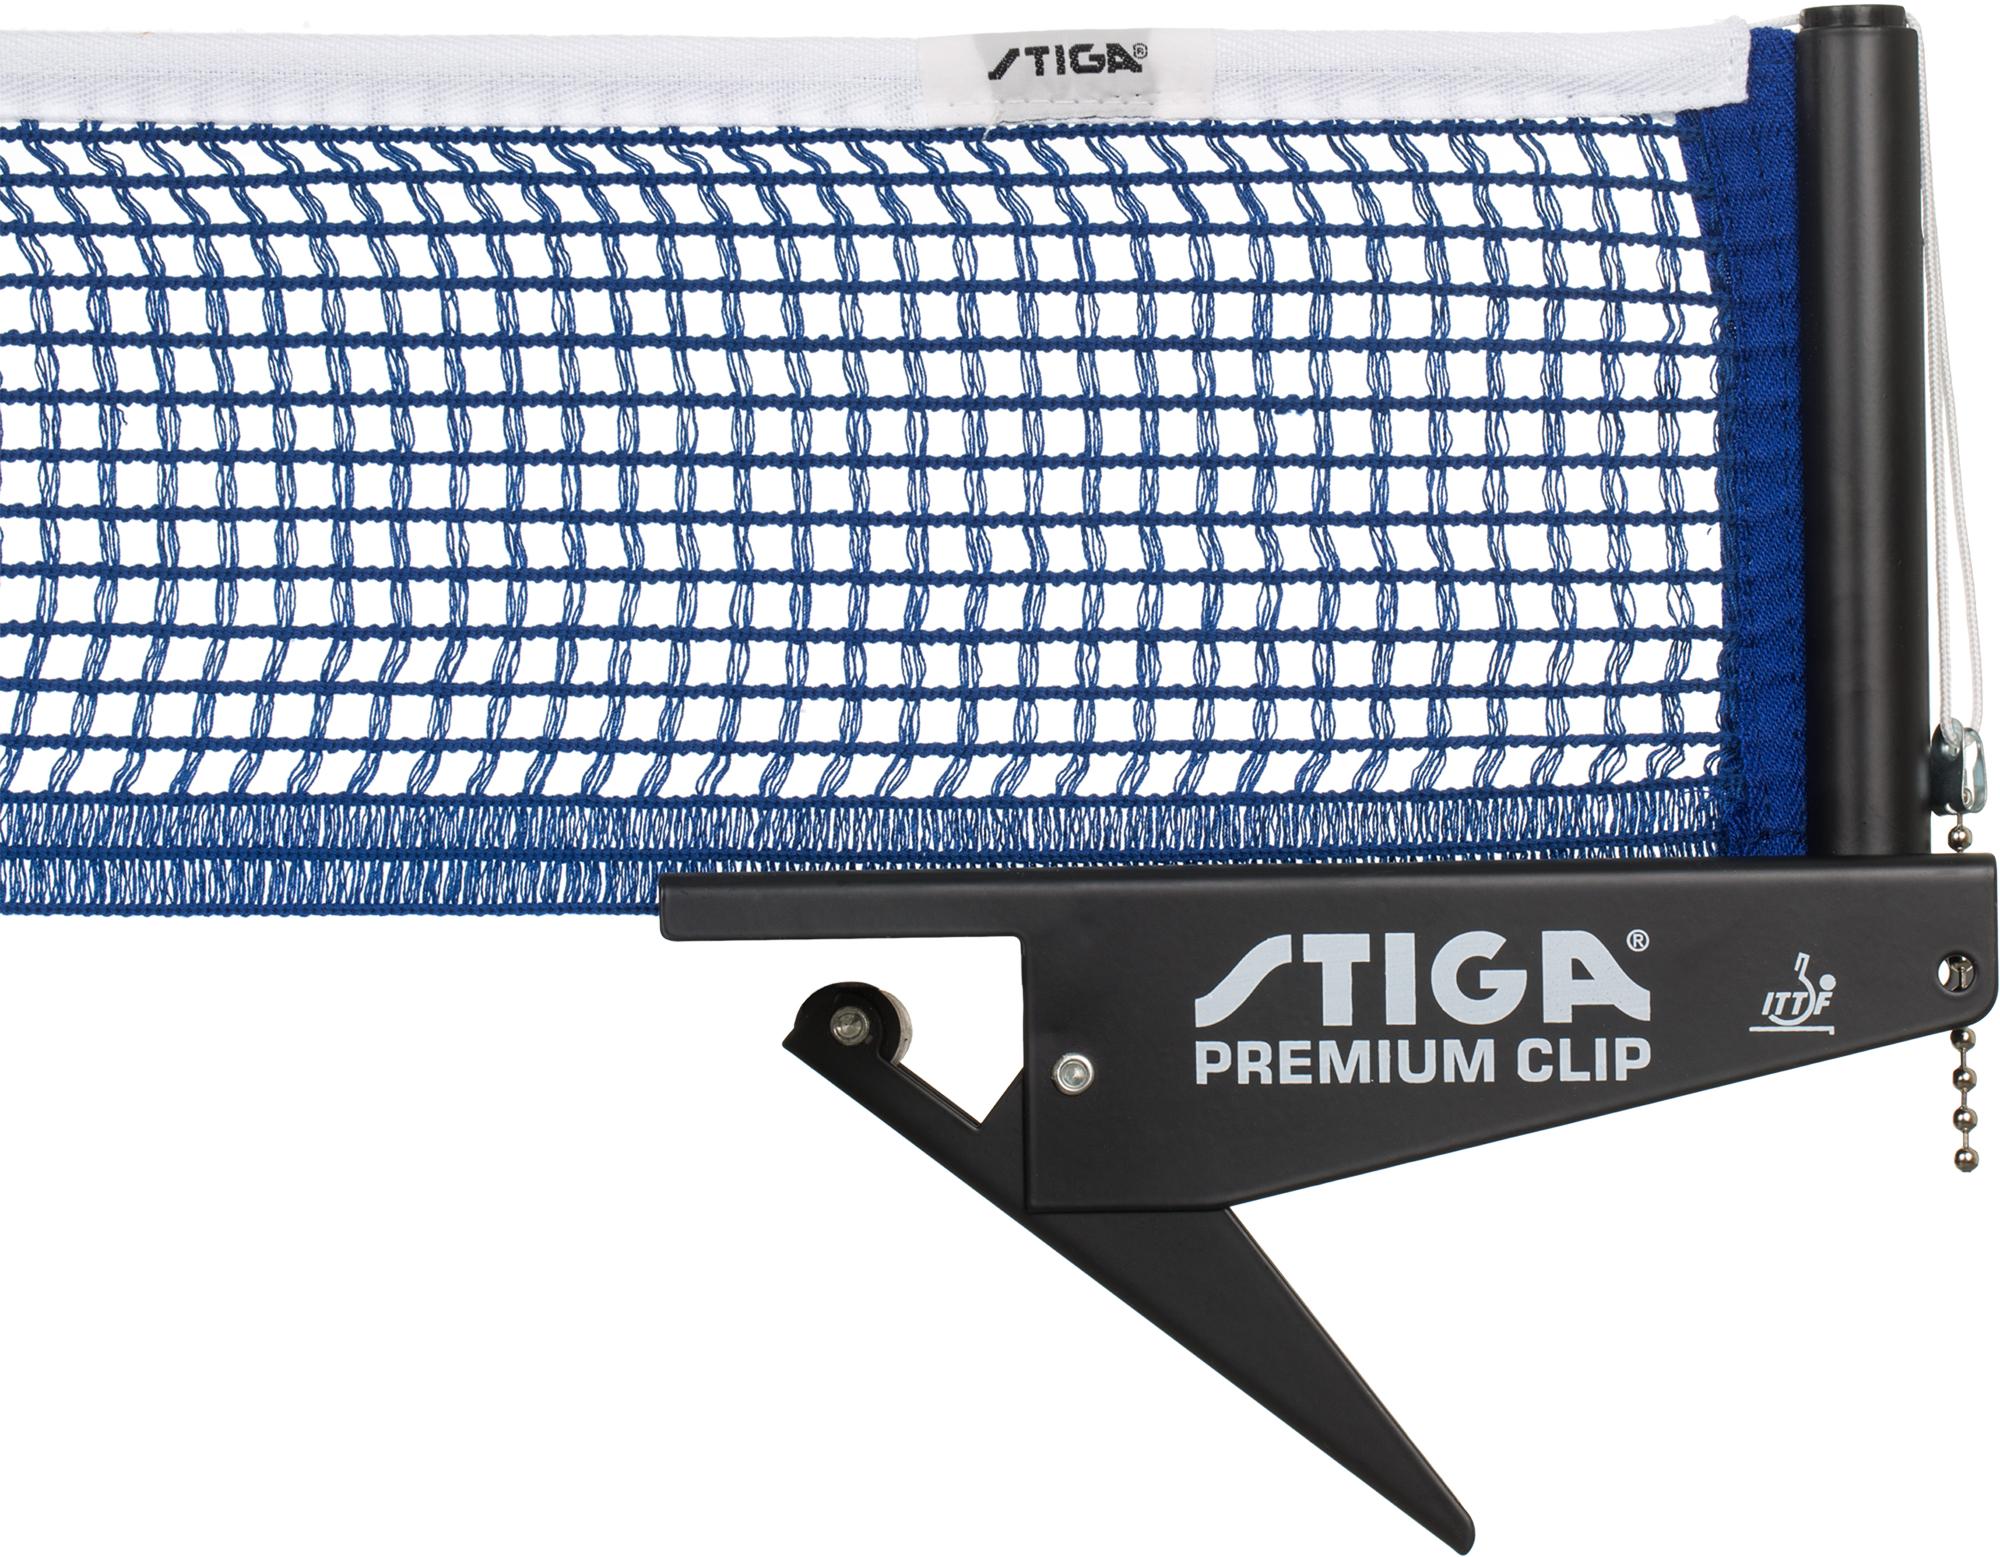 Stiga Сетка для настольного тенниса Stiga Premium Clip цена